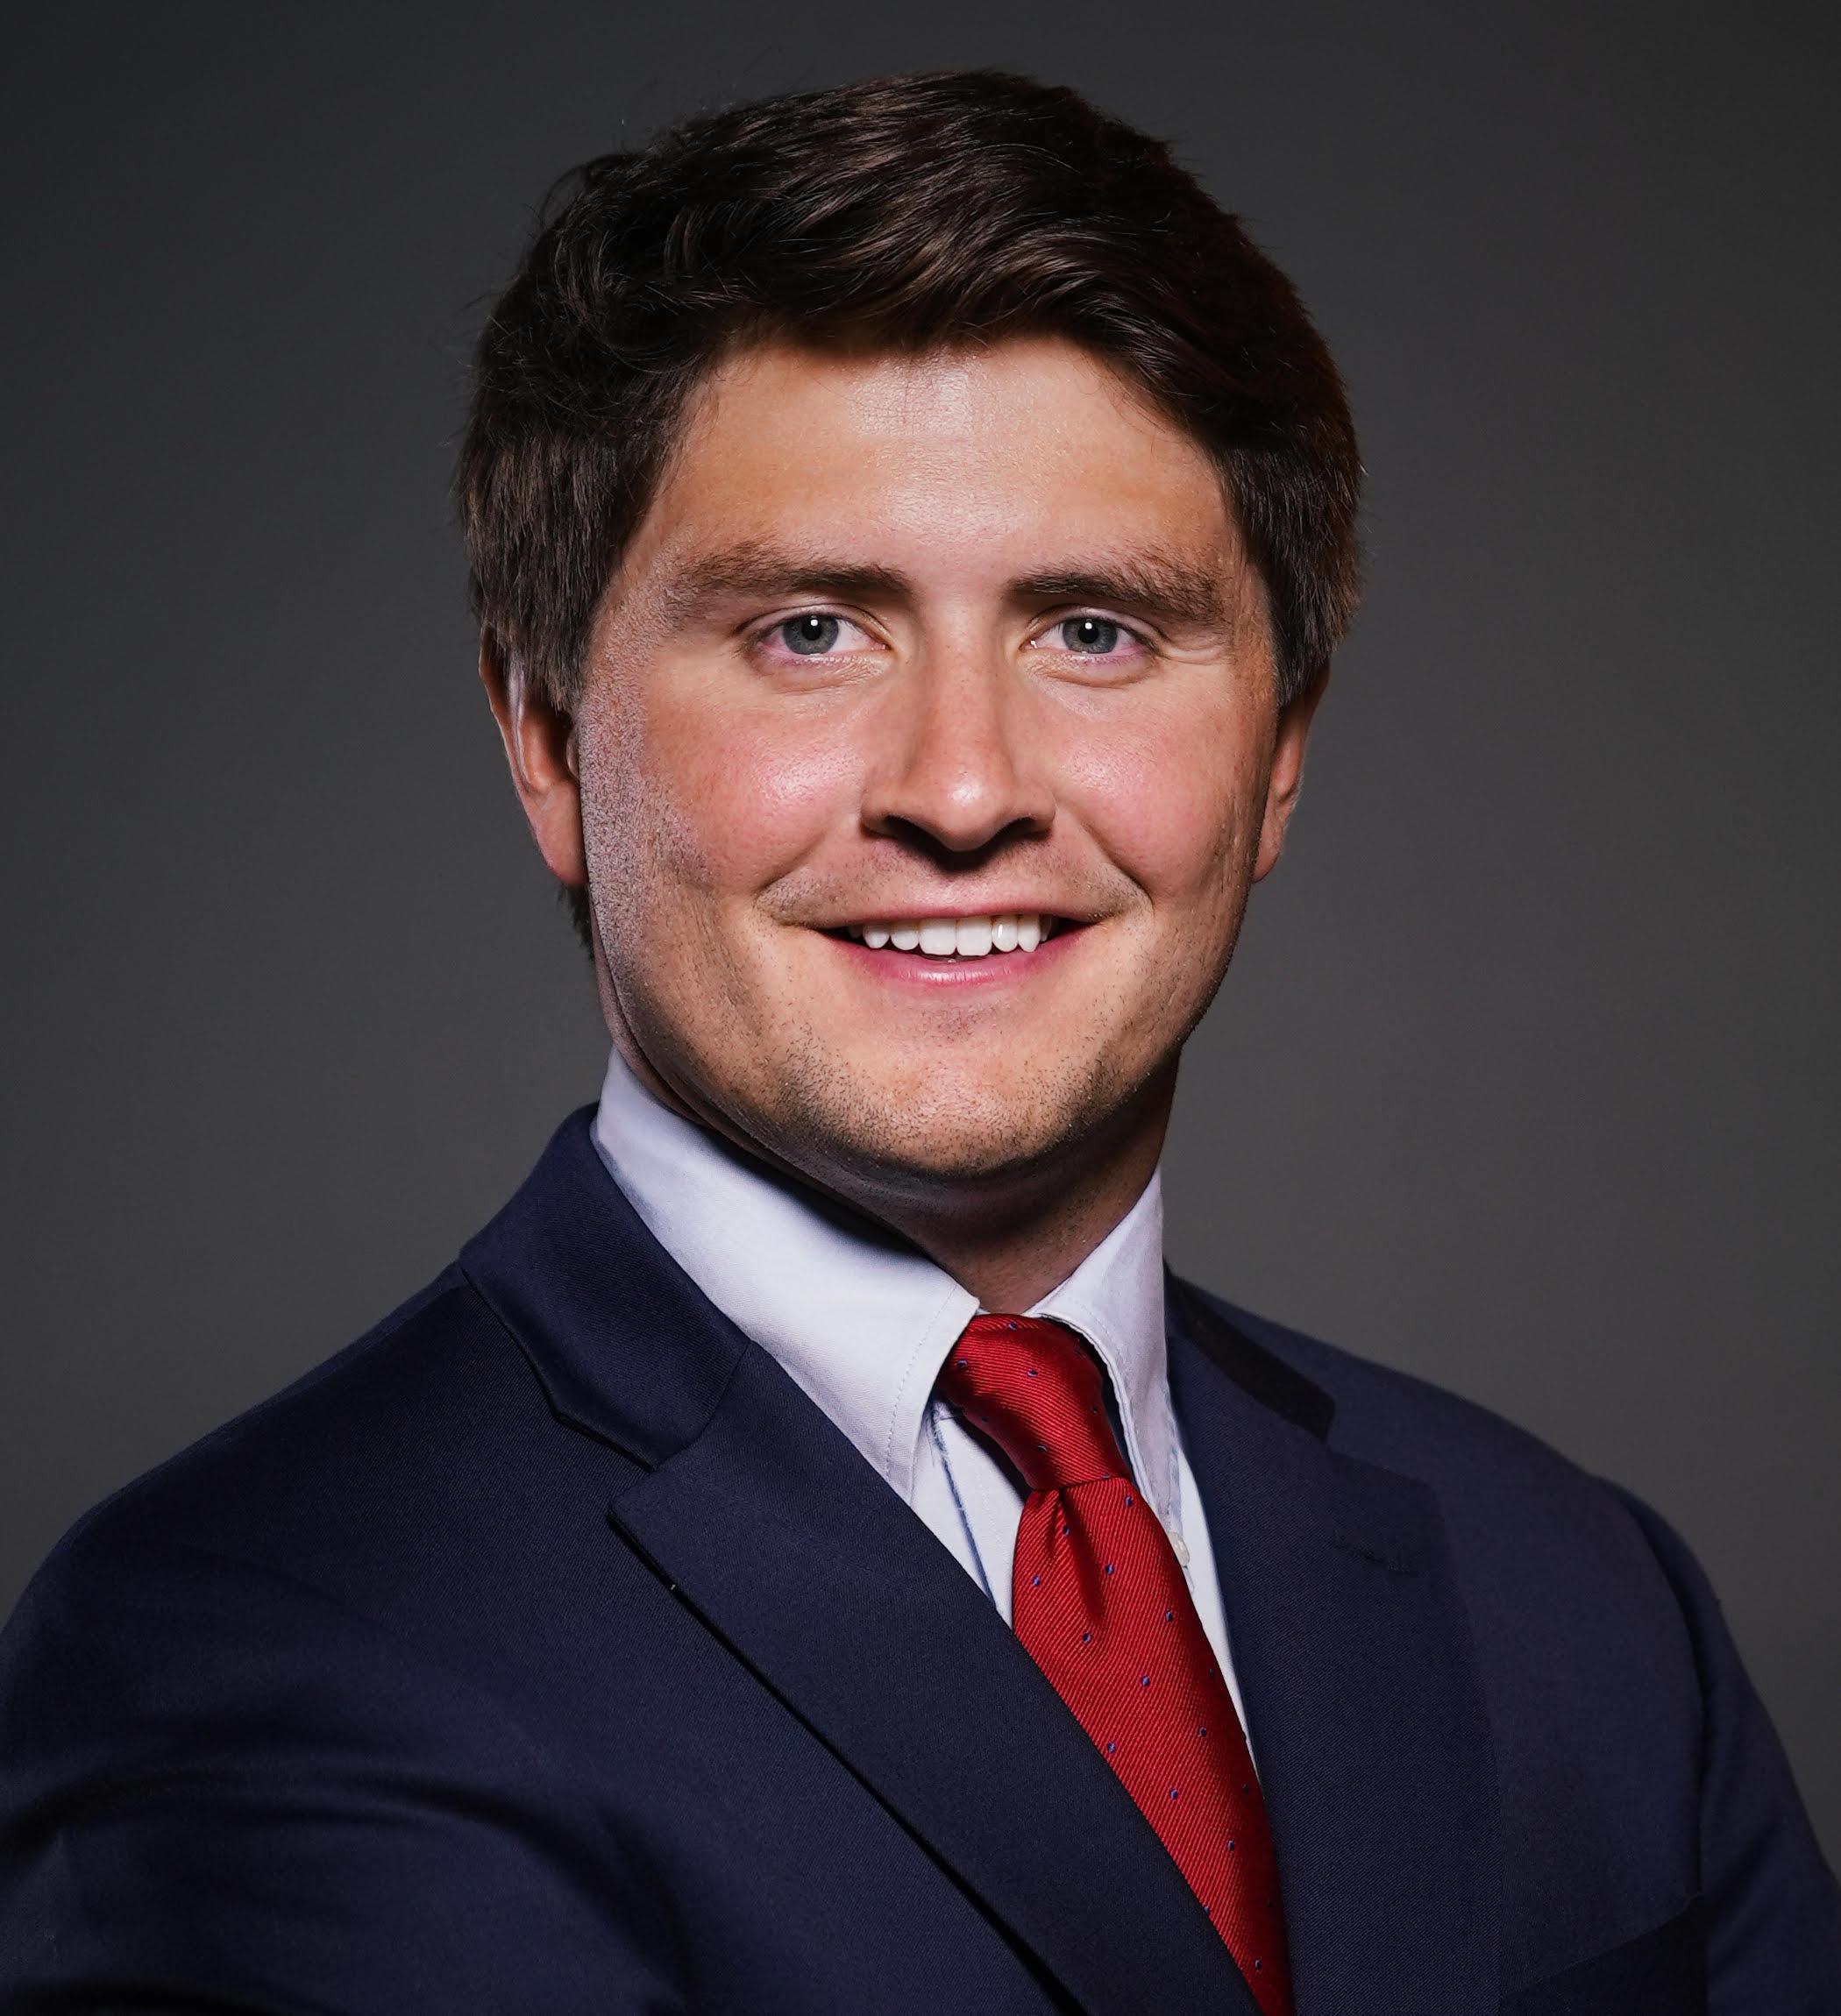 Conner Mosebrook Headshot | Dakota Investments